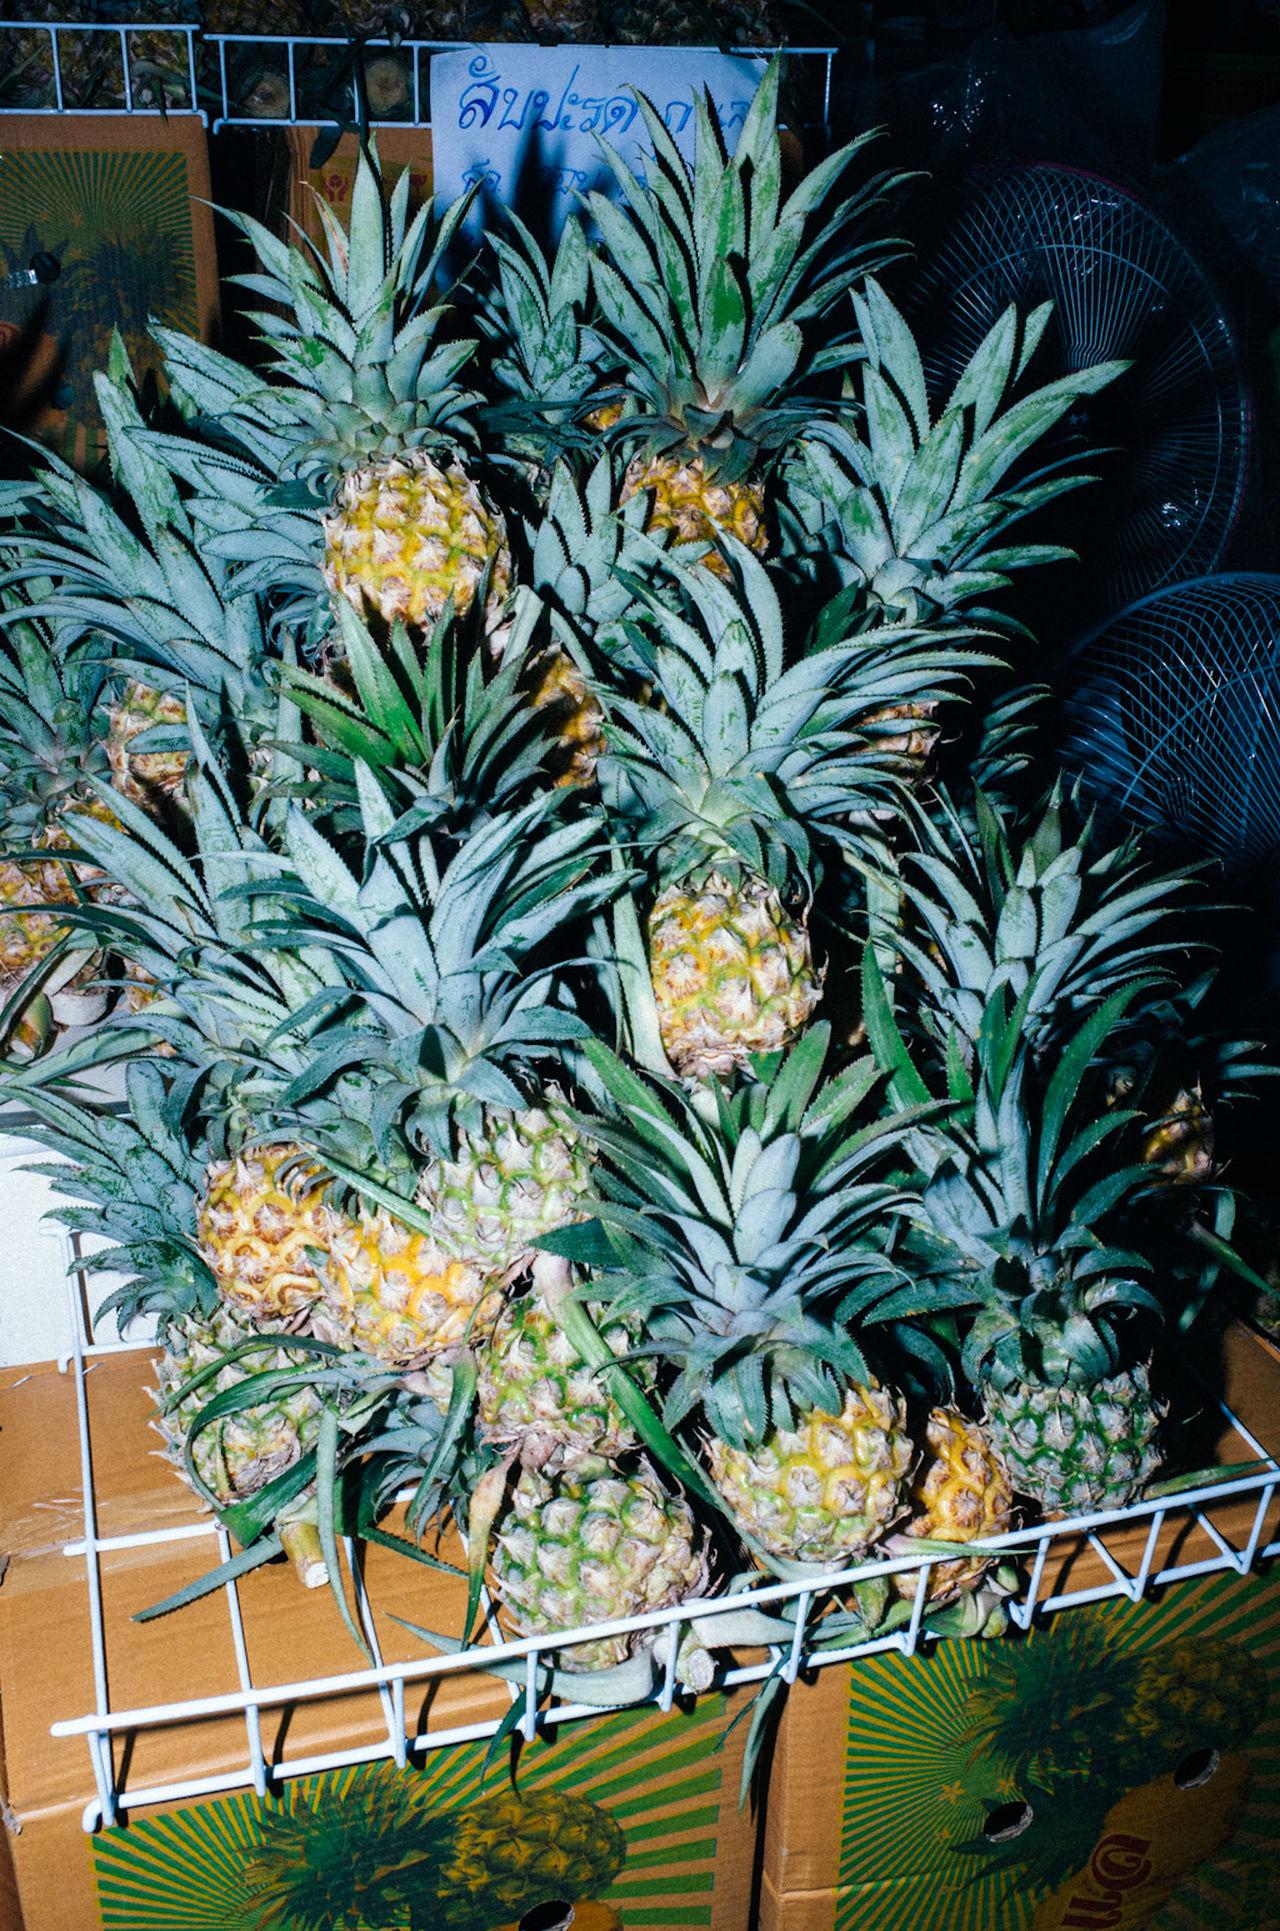 PINEAPPLE PARTY Bangkok Cool fresh fruit fruits Juice Market Pineapple pineapples Thailand